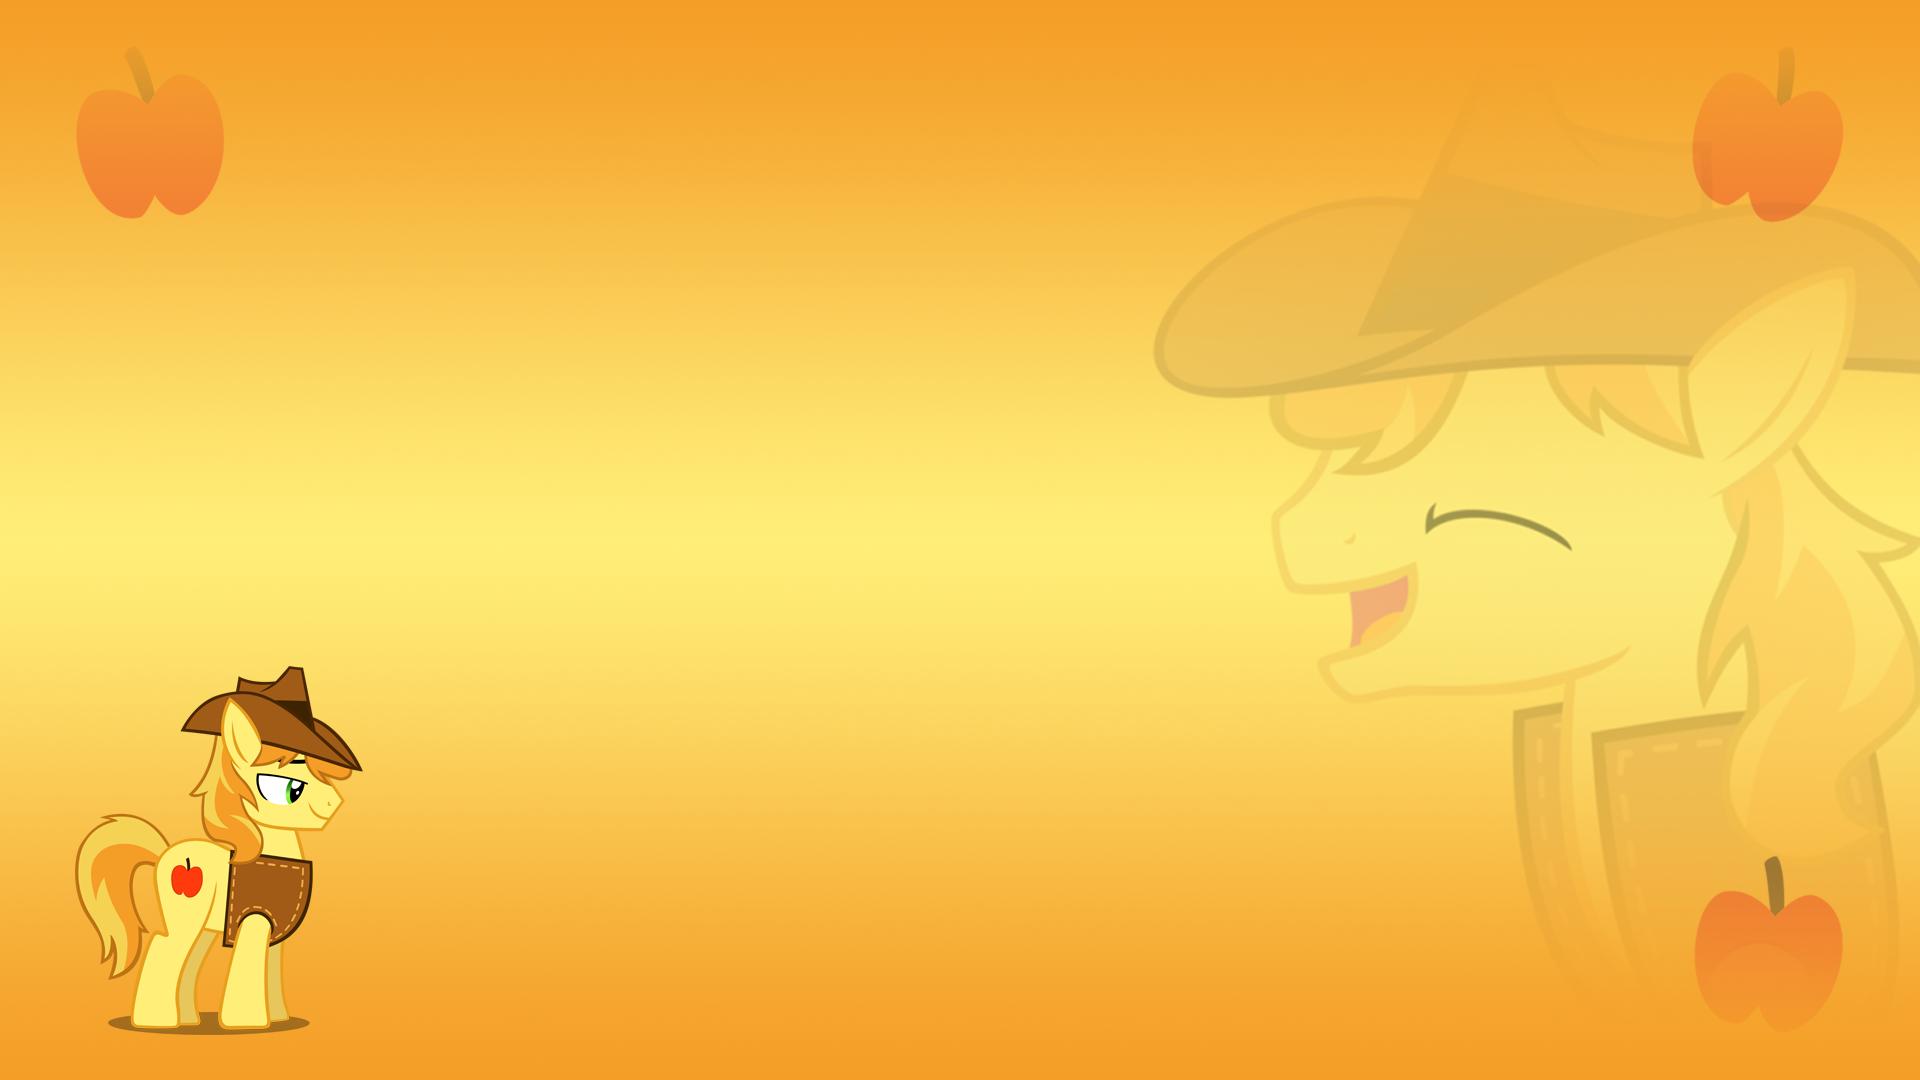 Braeburnt by Gratlofatic, Kishmond, Maximillian-Alpine and The-Smiling-Pony